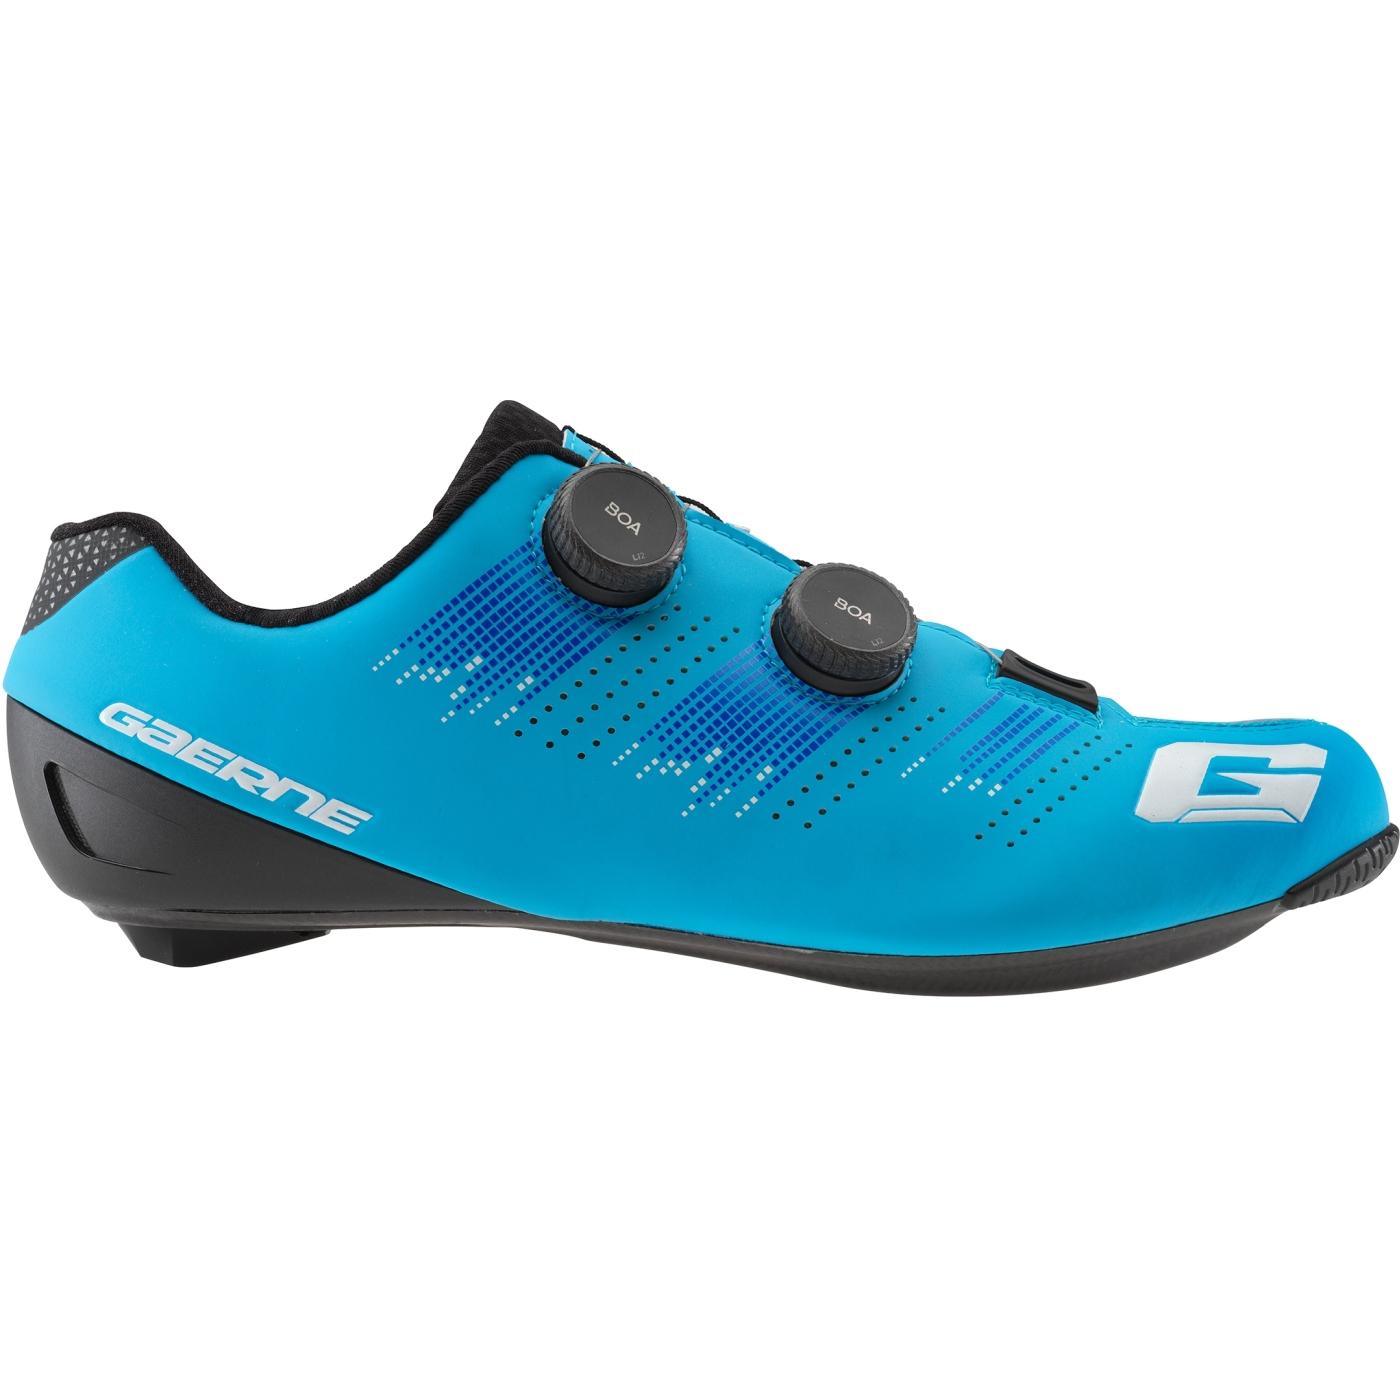 Gaerne Carbon G.Chrono Road Shoe - Matt Light Blue